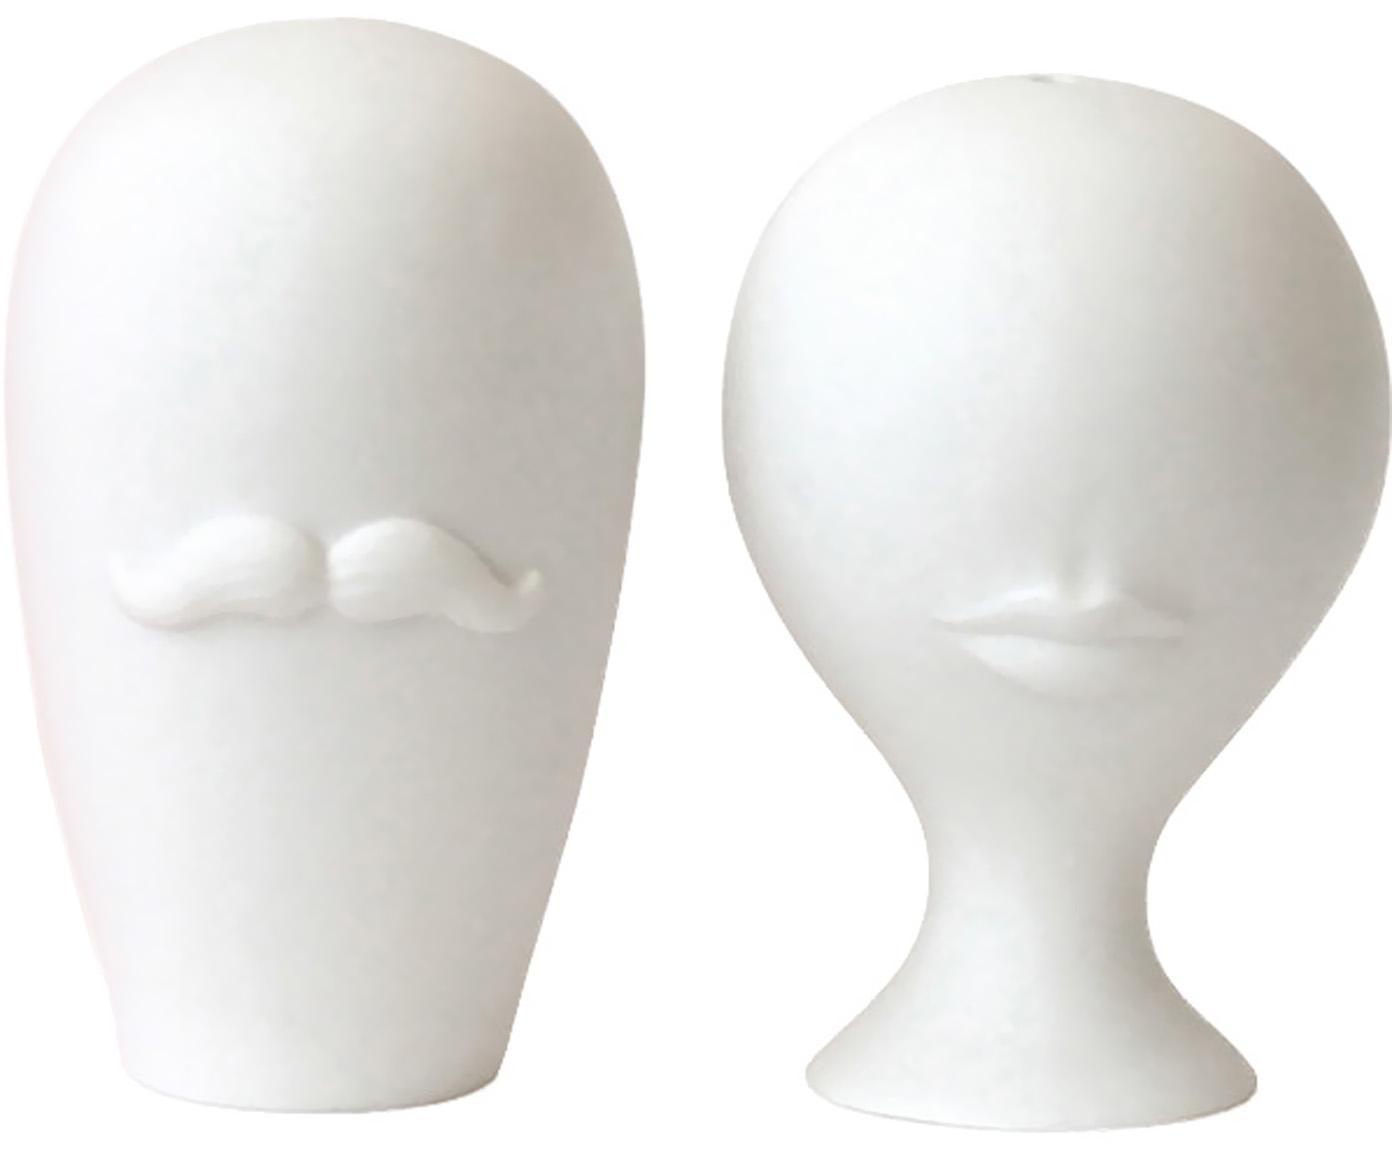 Set saliera e pepiera Muse 2 pz, Porcellana, Bianco, Ø 8 x Alt. 13 cm